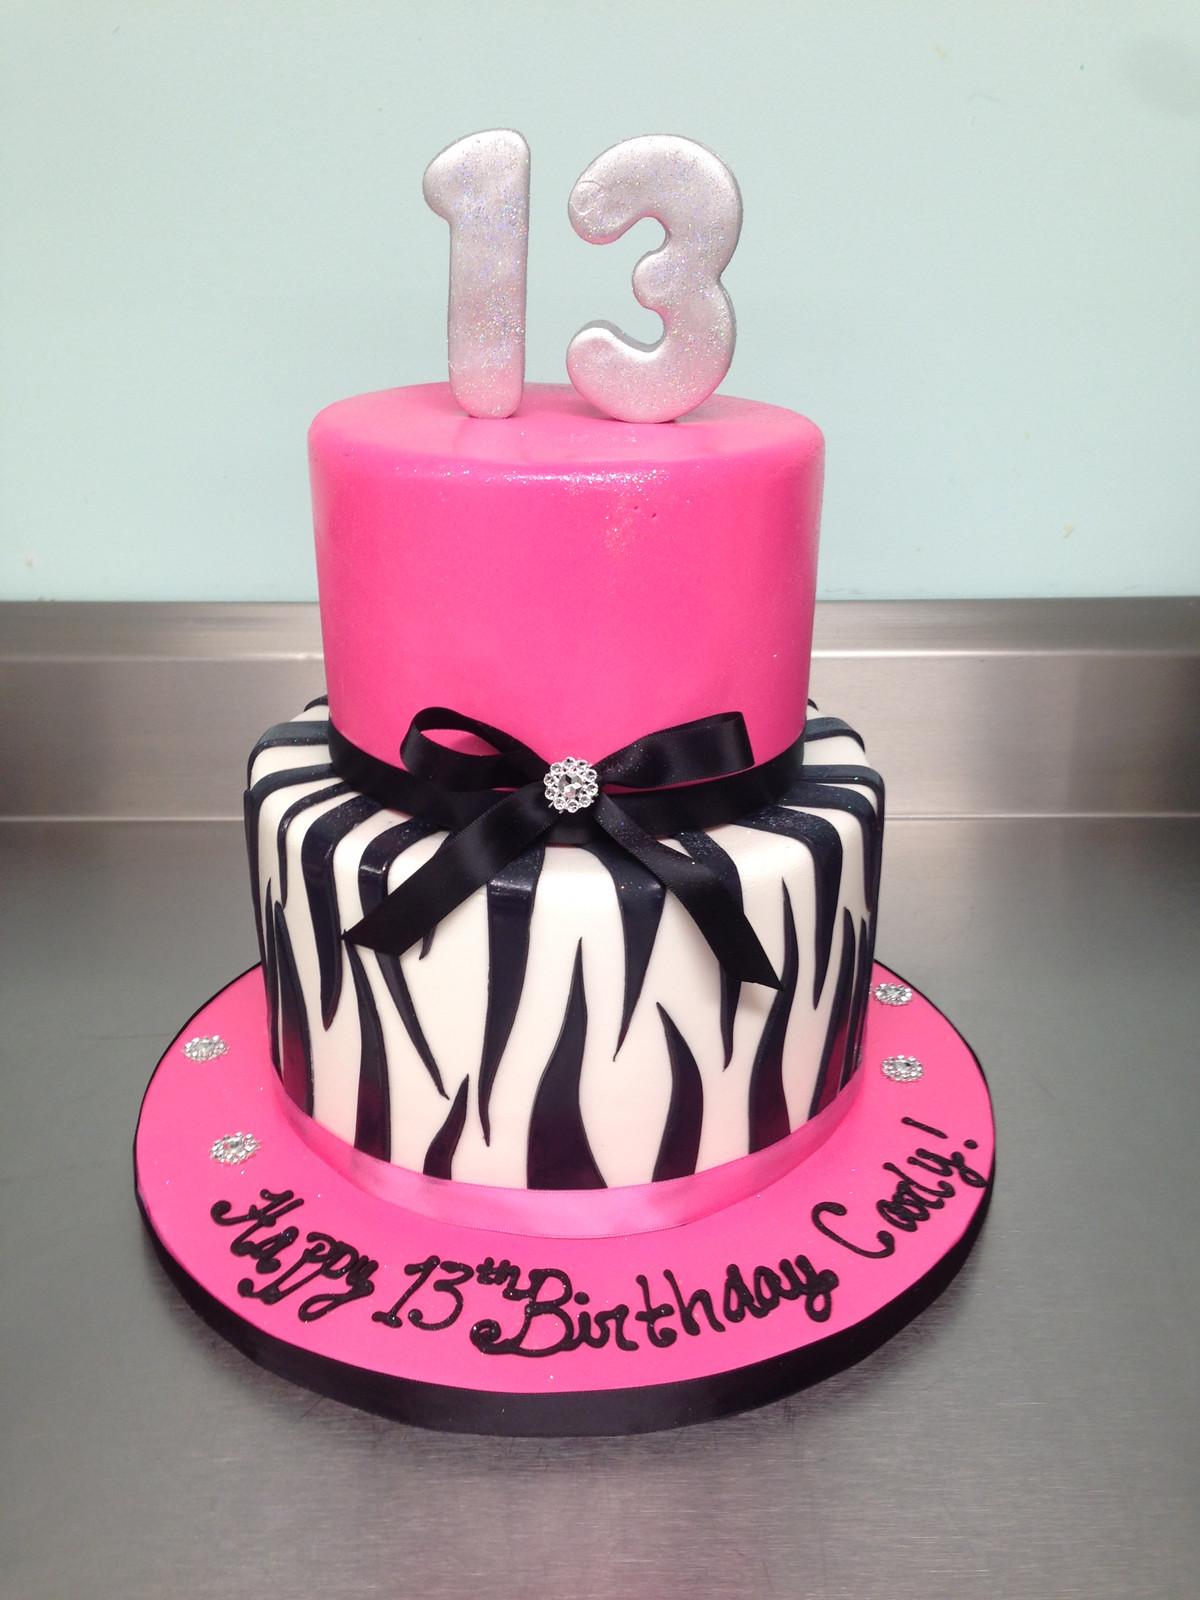 Astonishing Pink Zebra Print Birthday Cake Funny Birthday Cards Online Alyptdamsfinfo